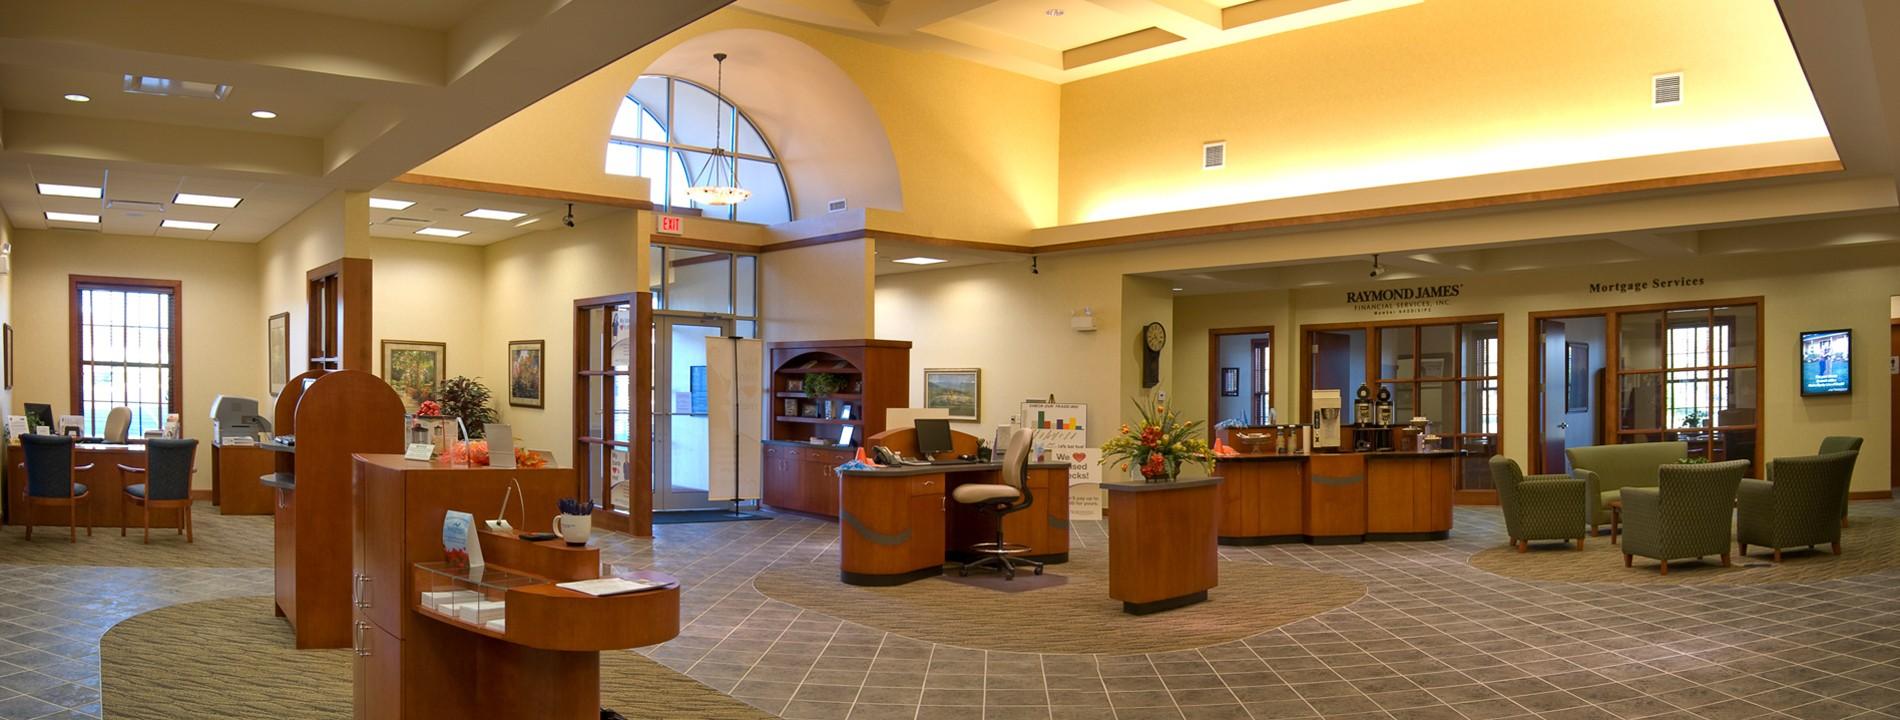 Urgent Care Fayetteville Ga >> Neuhoff Taylor Architects